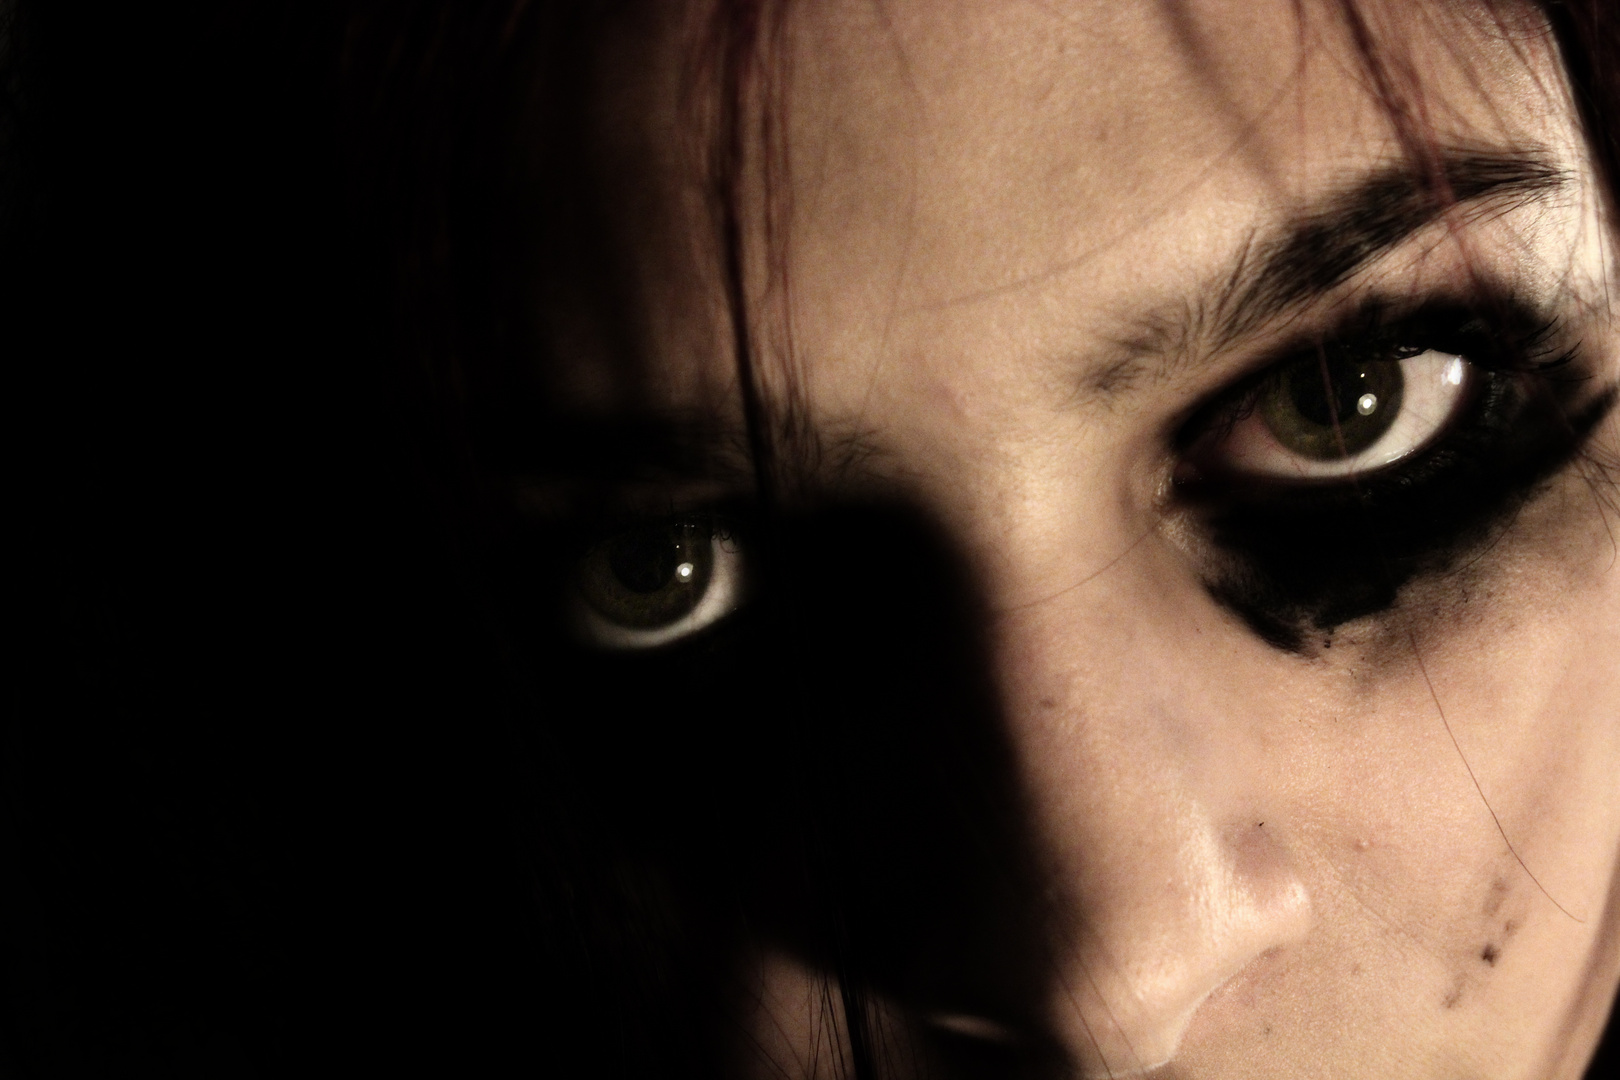 dark and evil